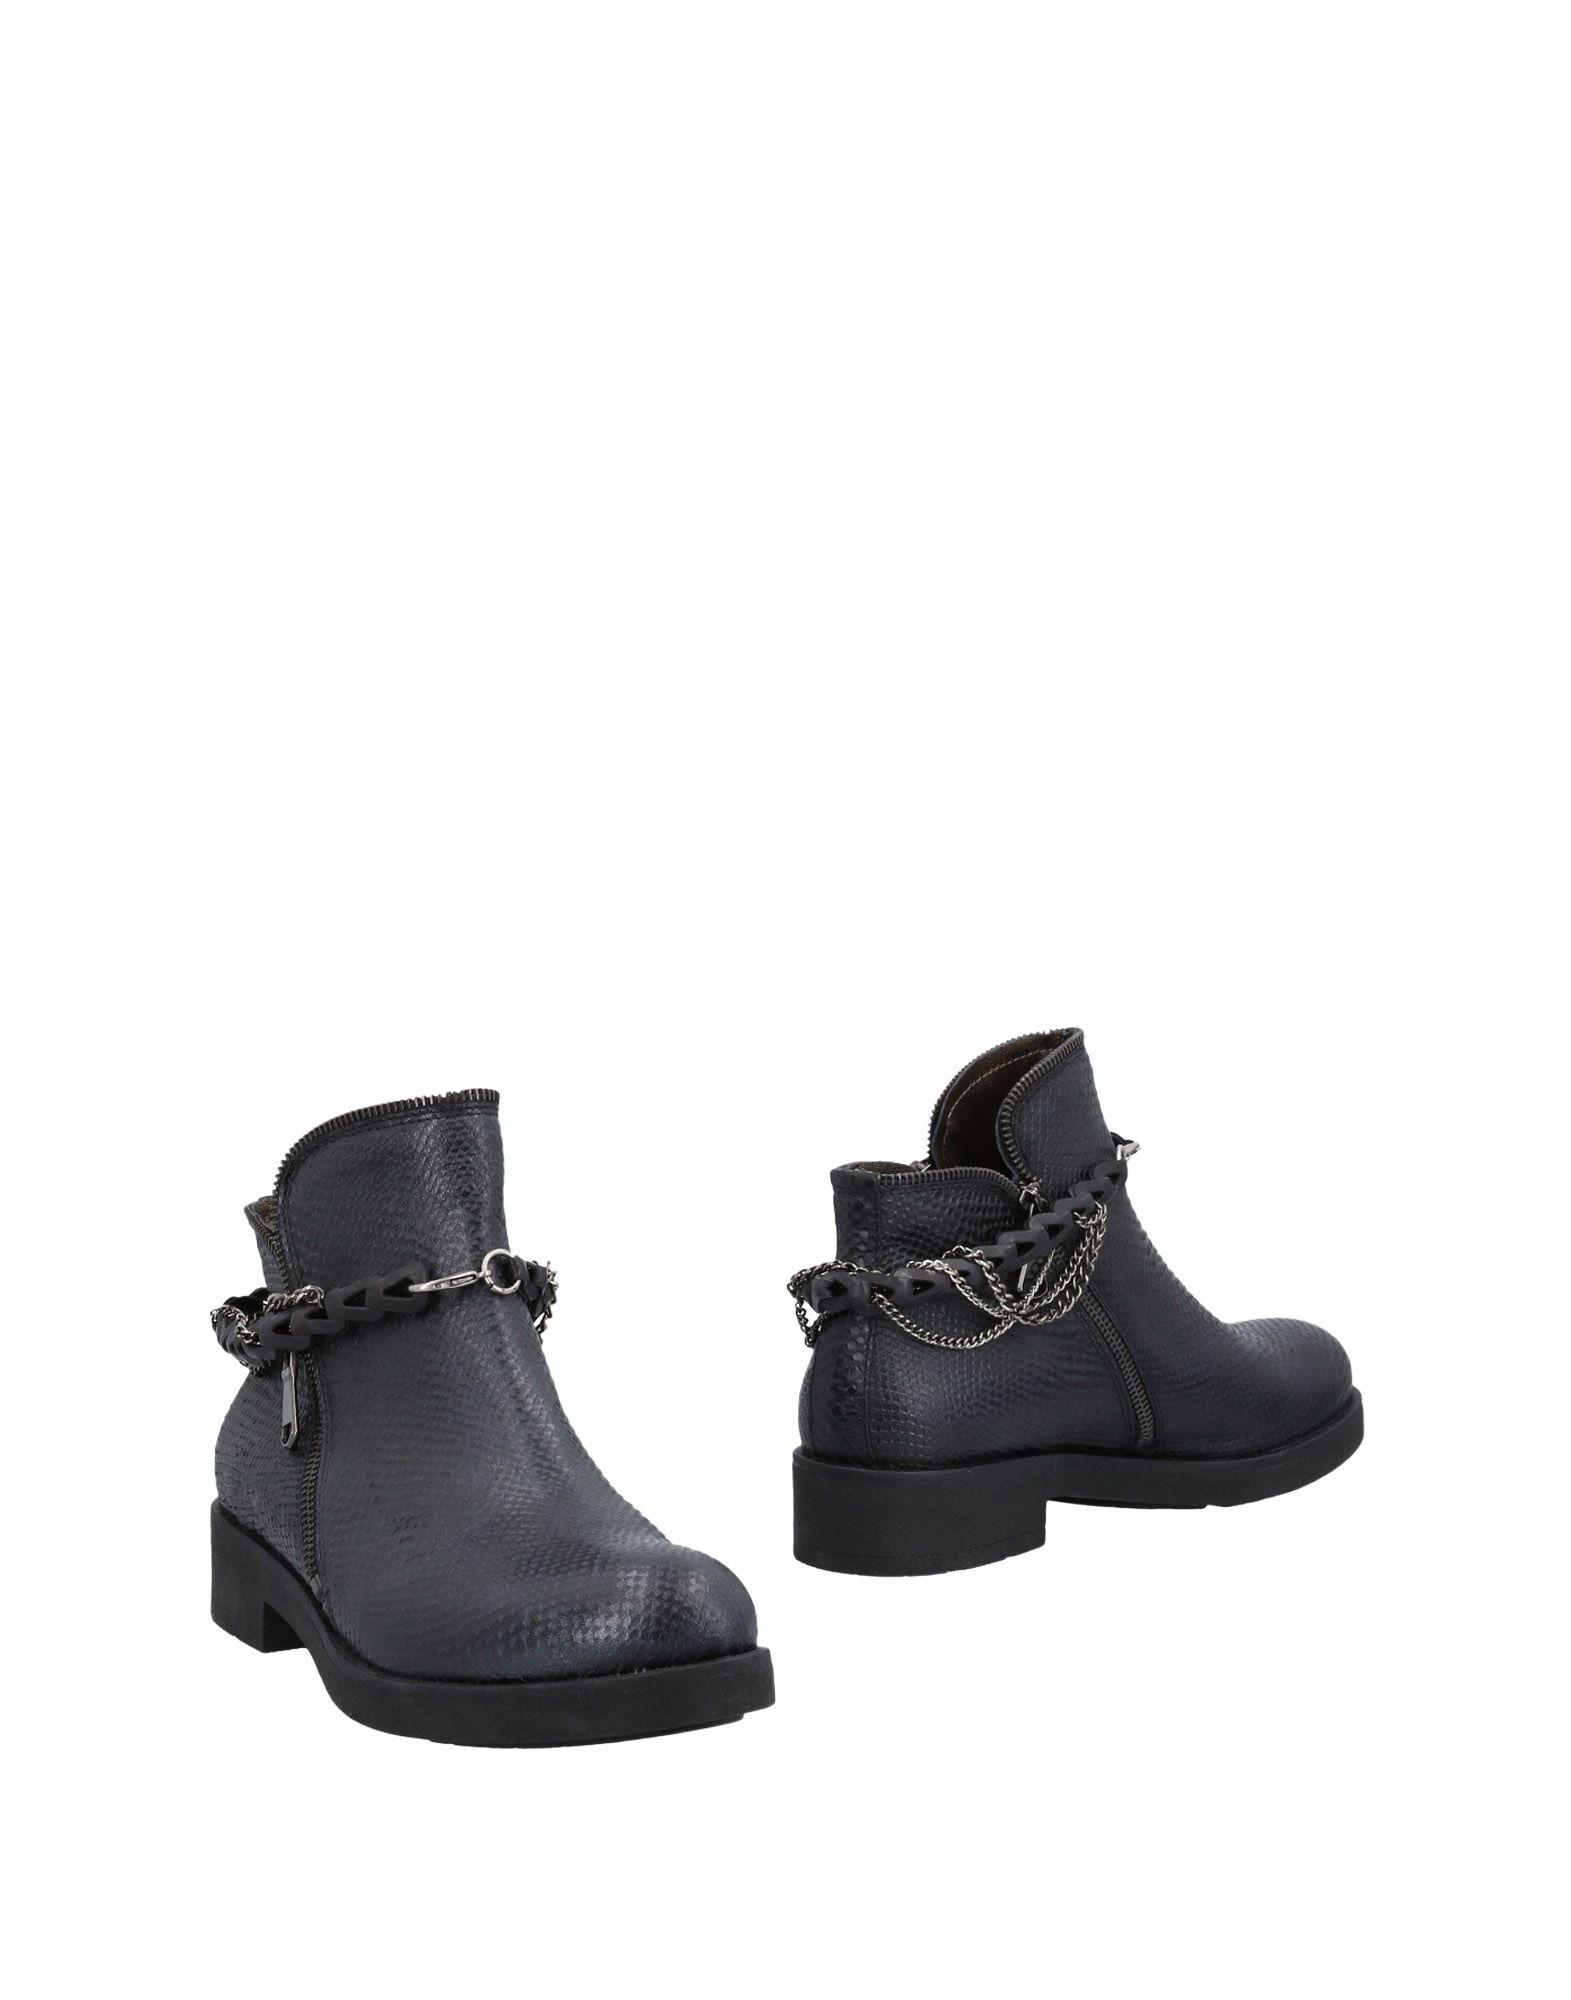 Tosca Blu Schuhes Stiefelette Damen  11484096PV Gute Schuhe Qualität beliebte Schuhe Gute 38505a